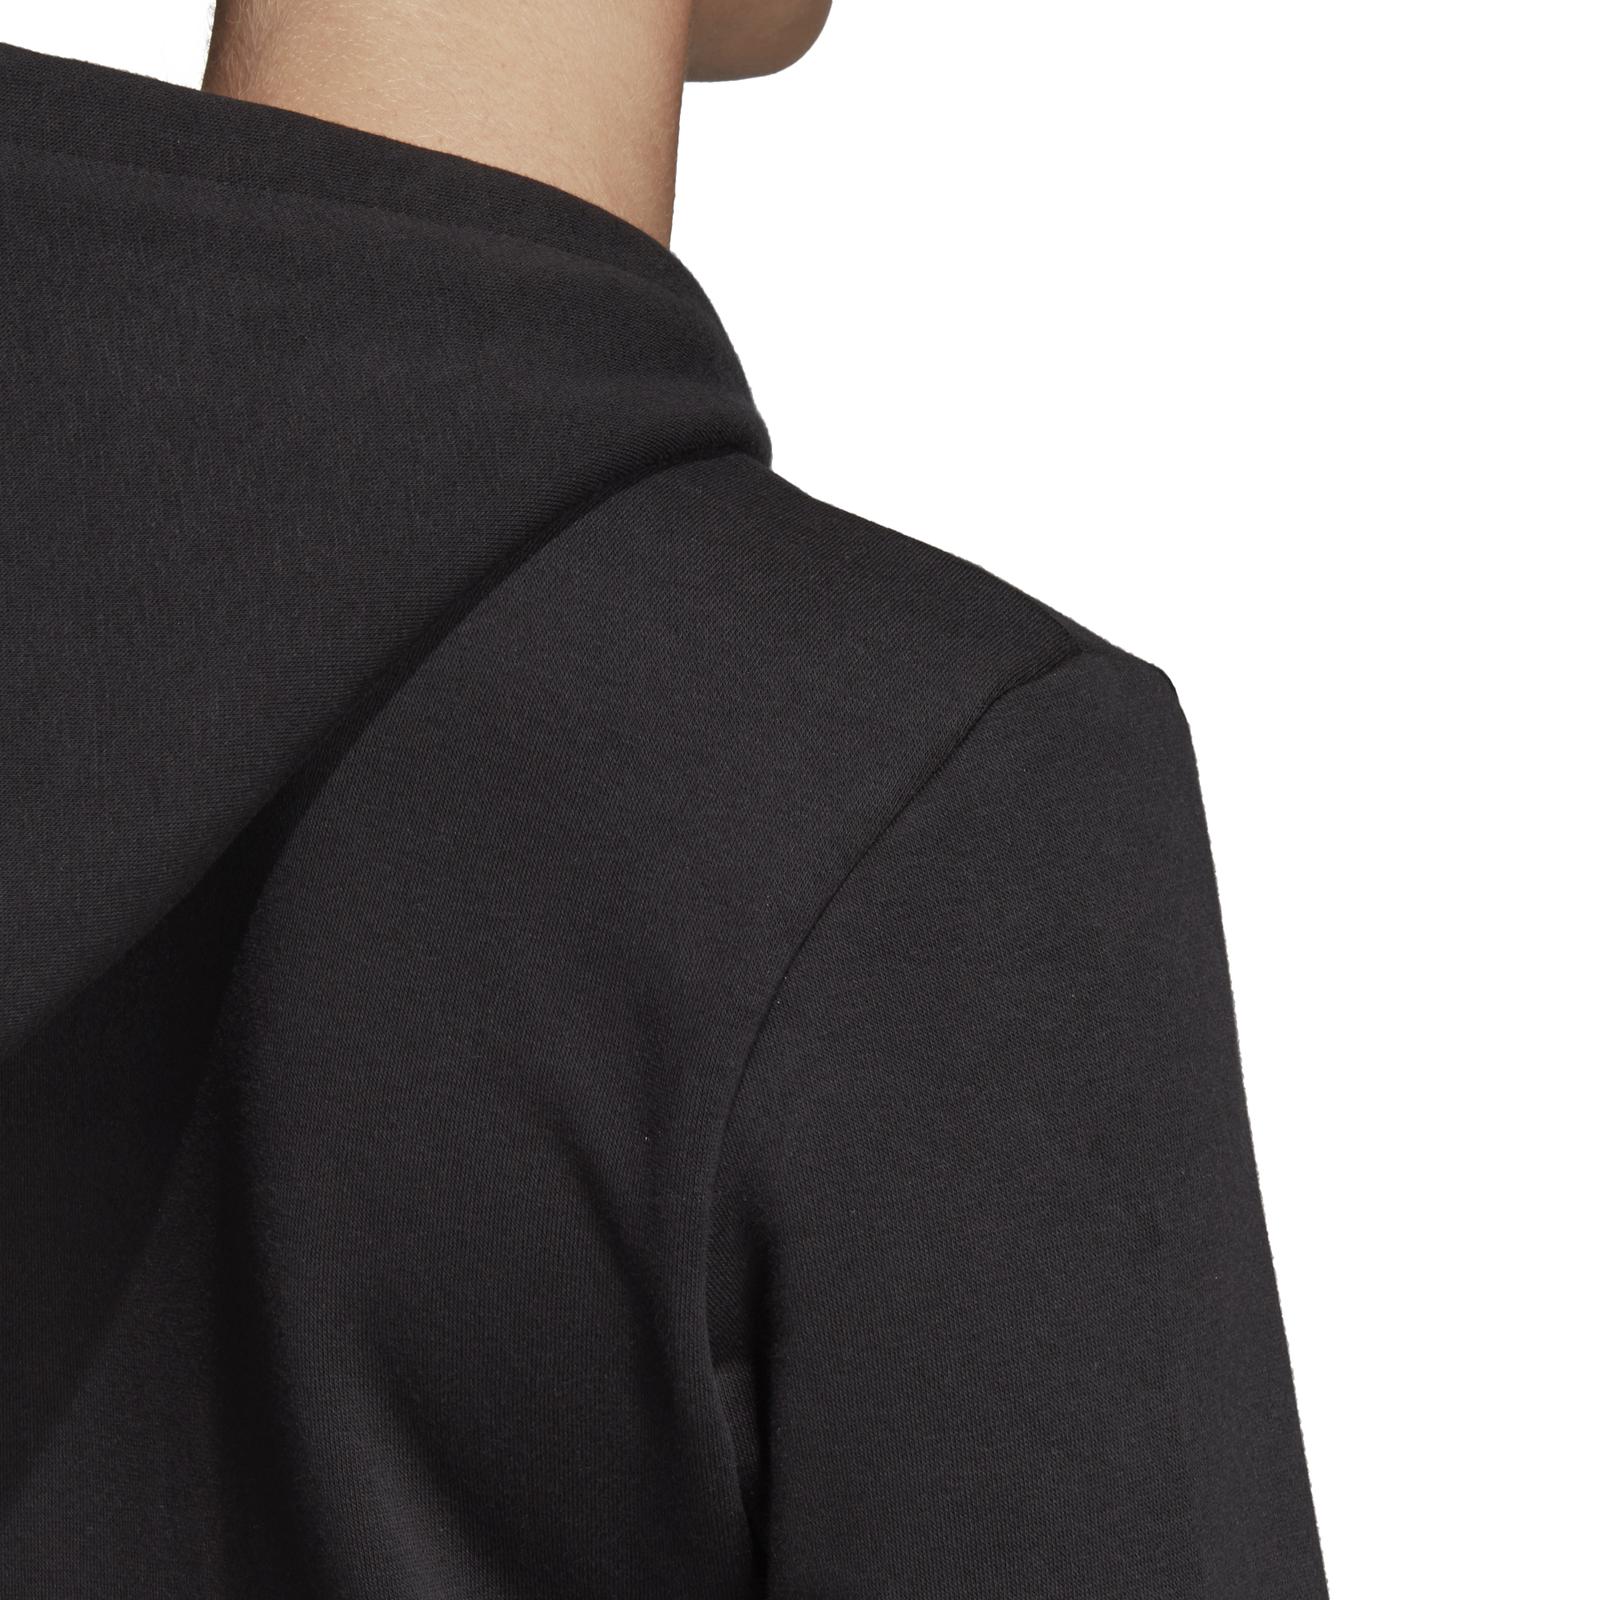 Details about Adidas Core Women Fitness Hoody Eat Linear Full Zip Fleece Hoodie Black